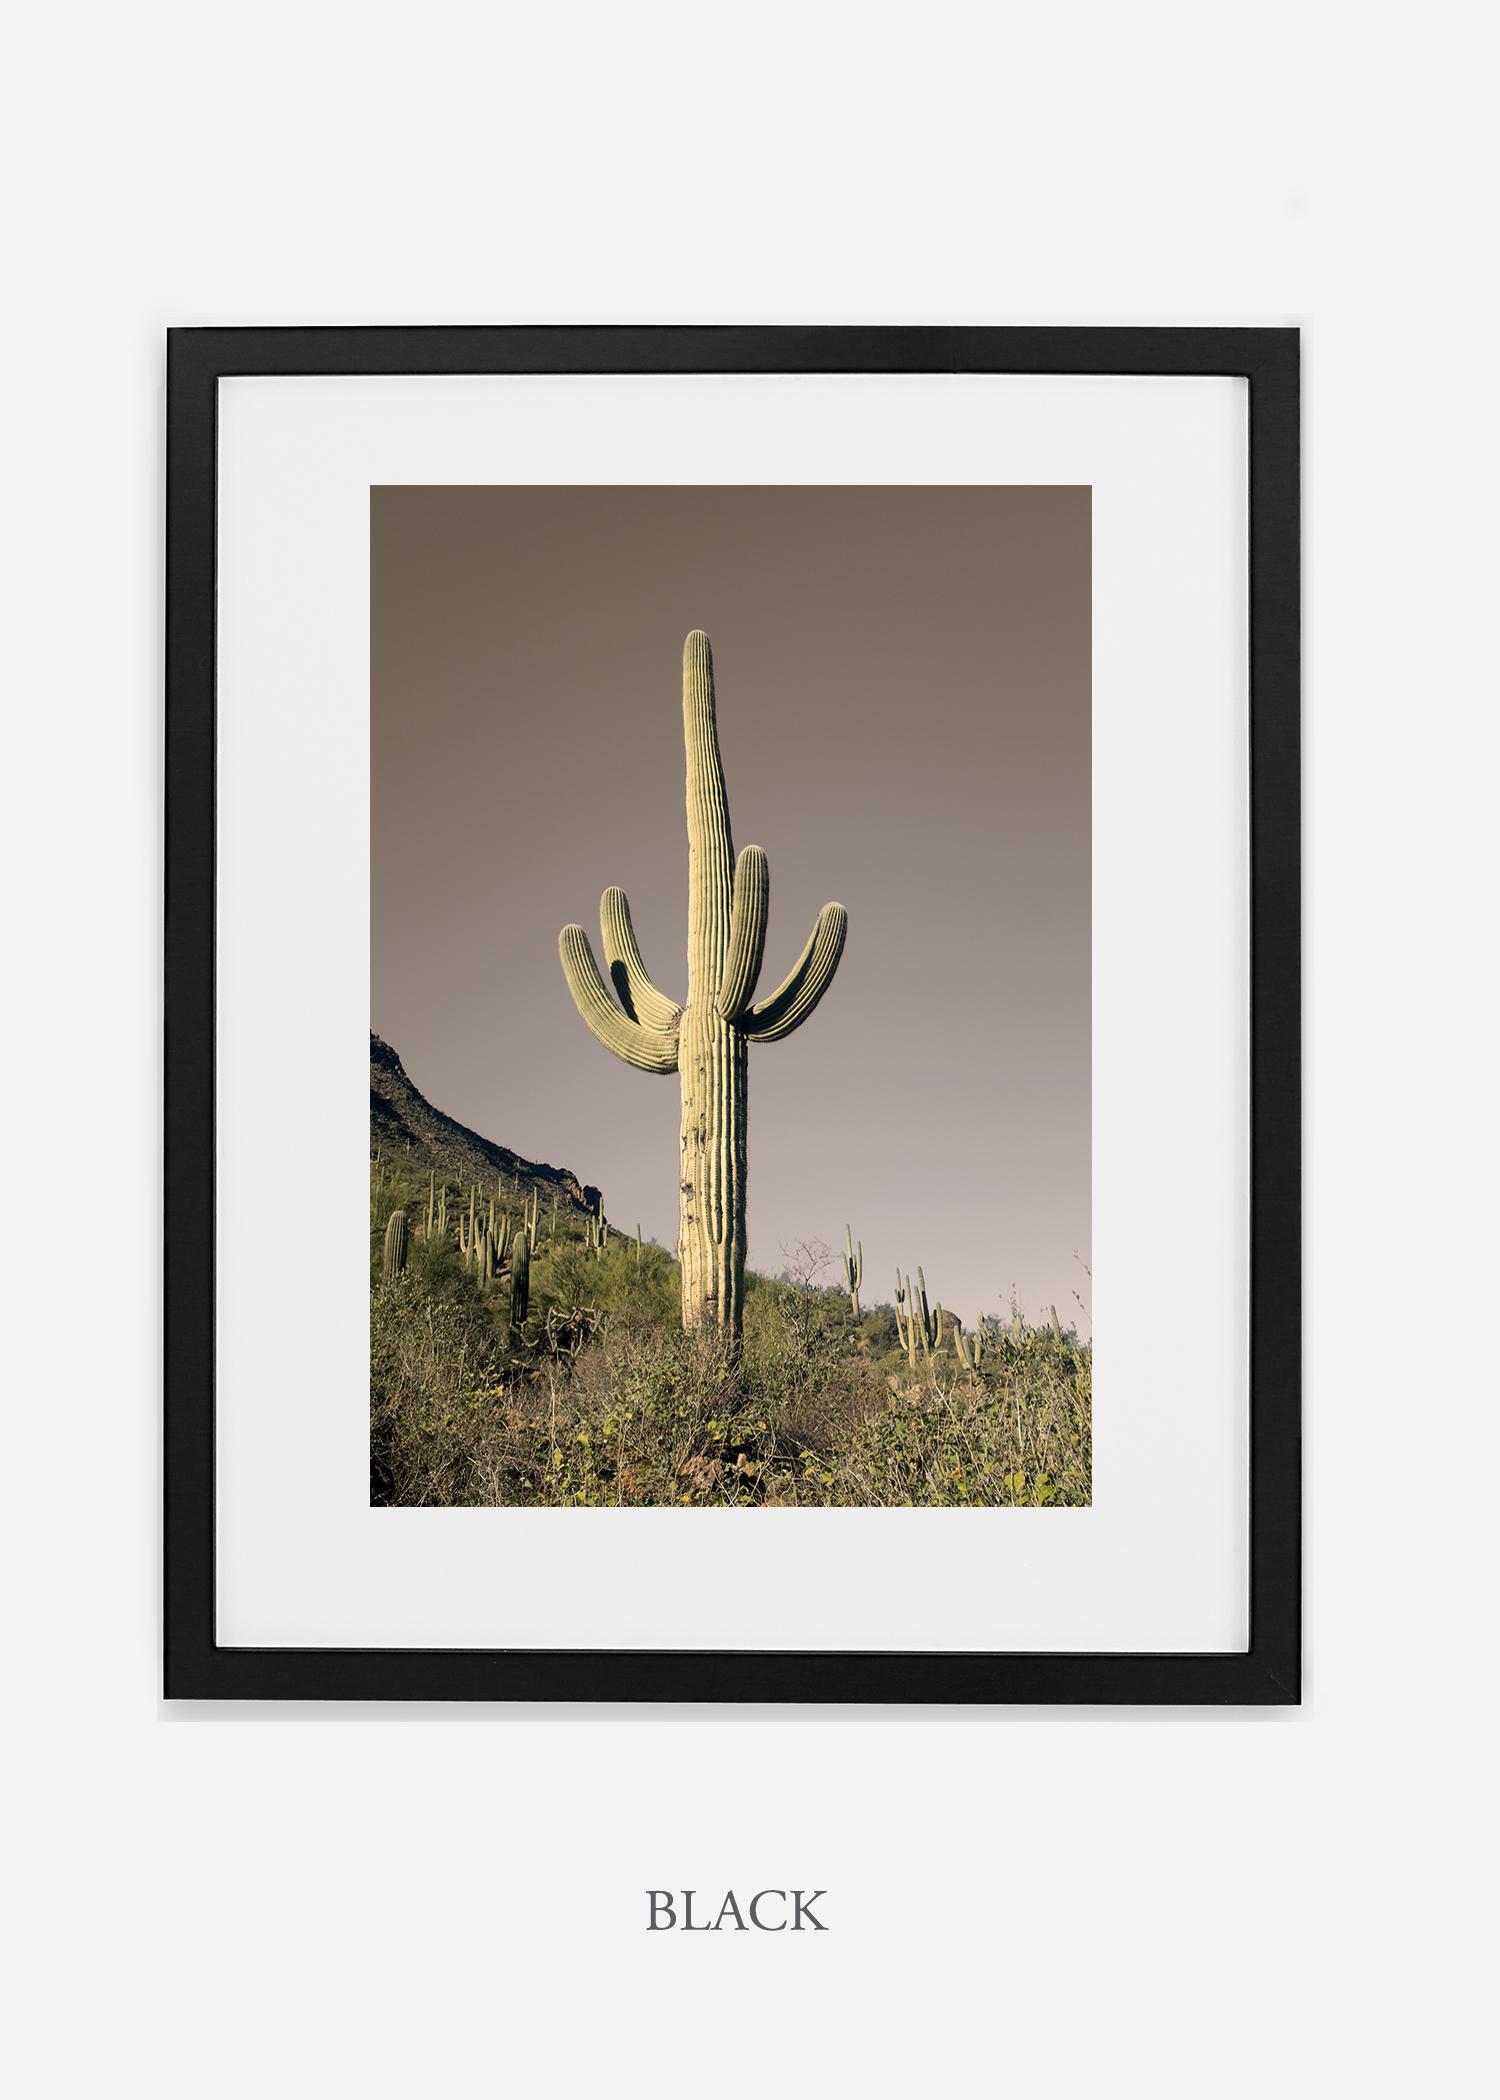 blackframe-saguaroNo.29-wildercalifornia-art-wallart-cactusprint-homedecor-prints-arizona-botanical-artwork-interiordesign.jpg